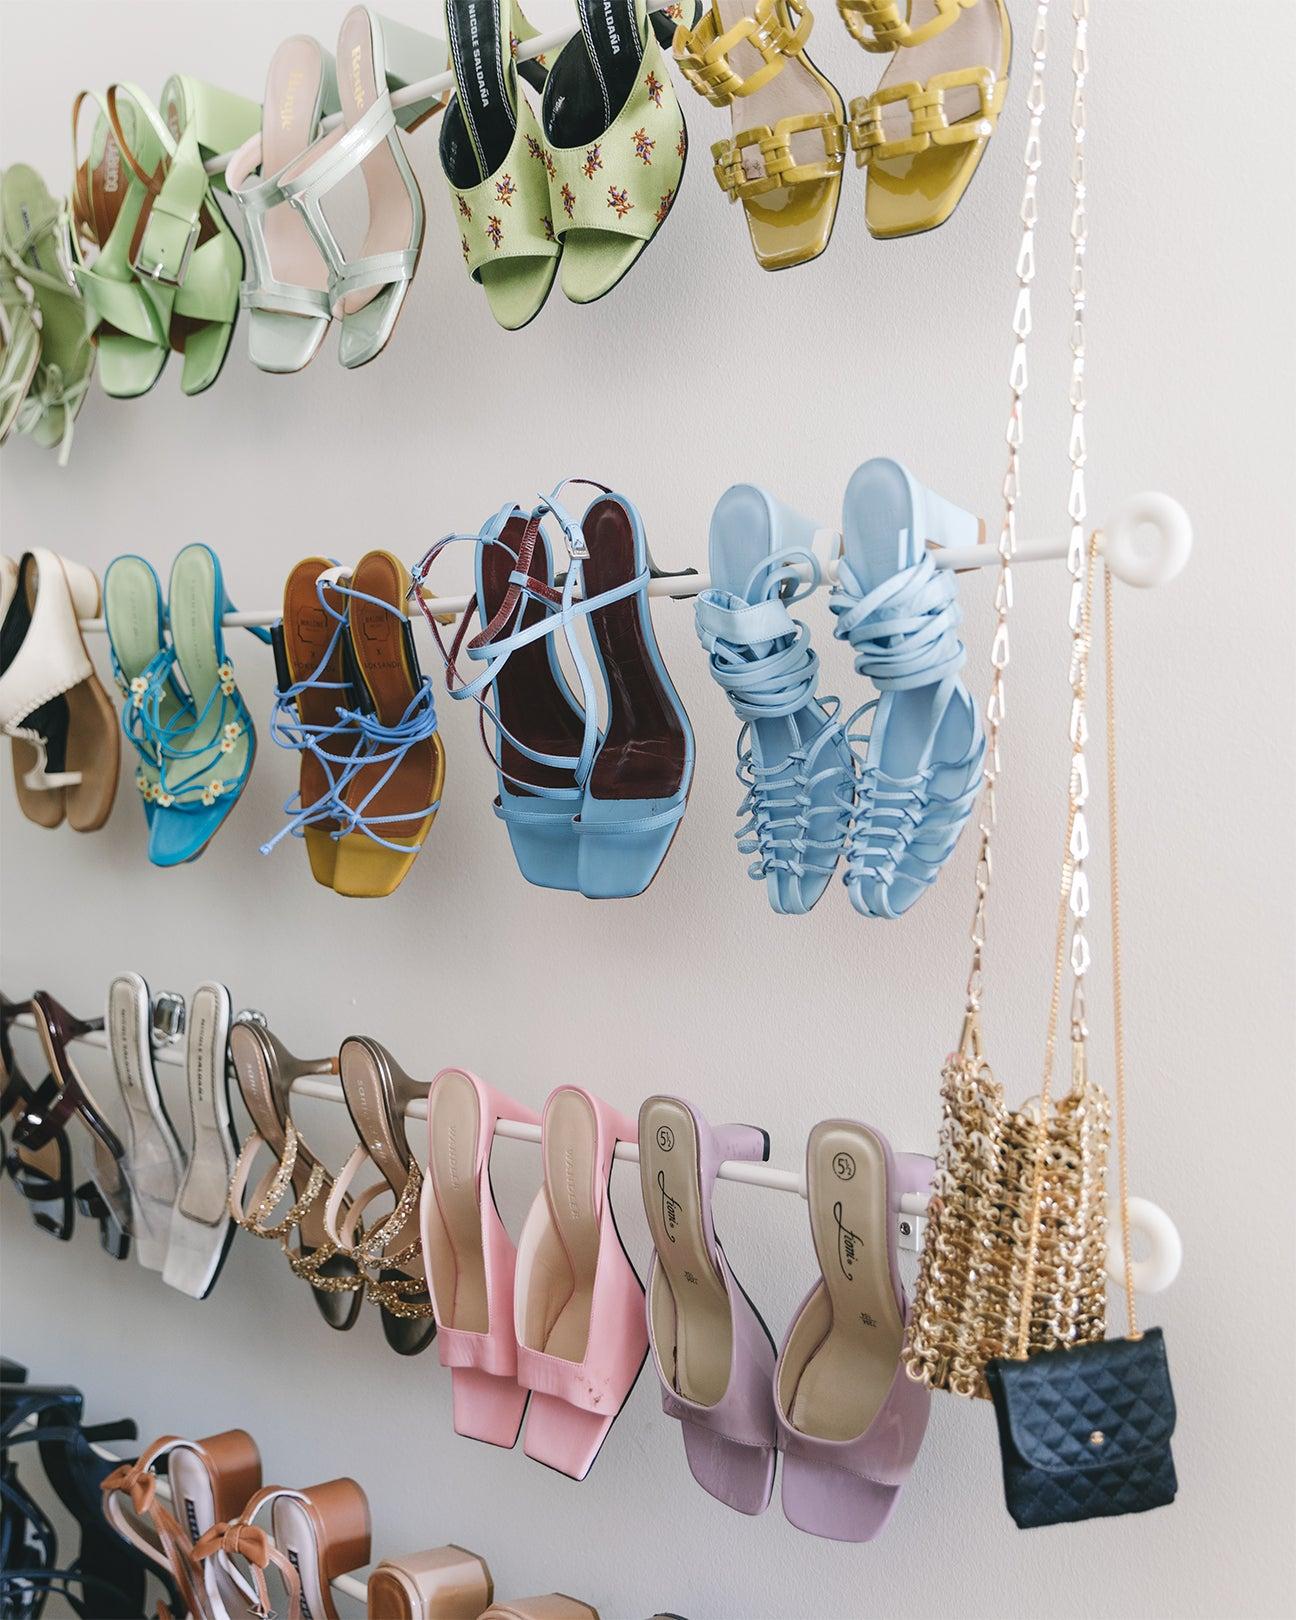 rainbow assortment of shoes